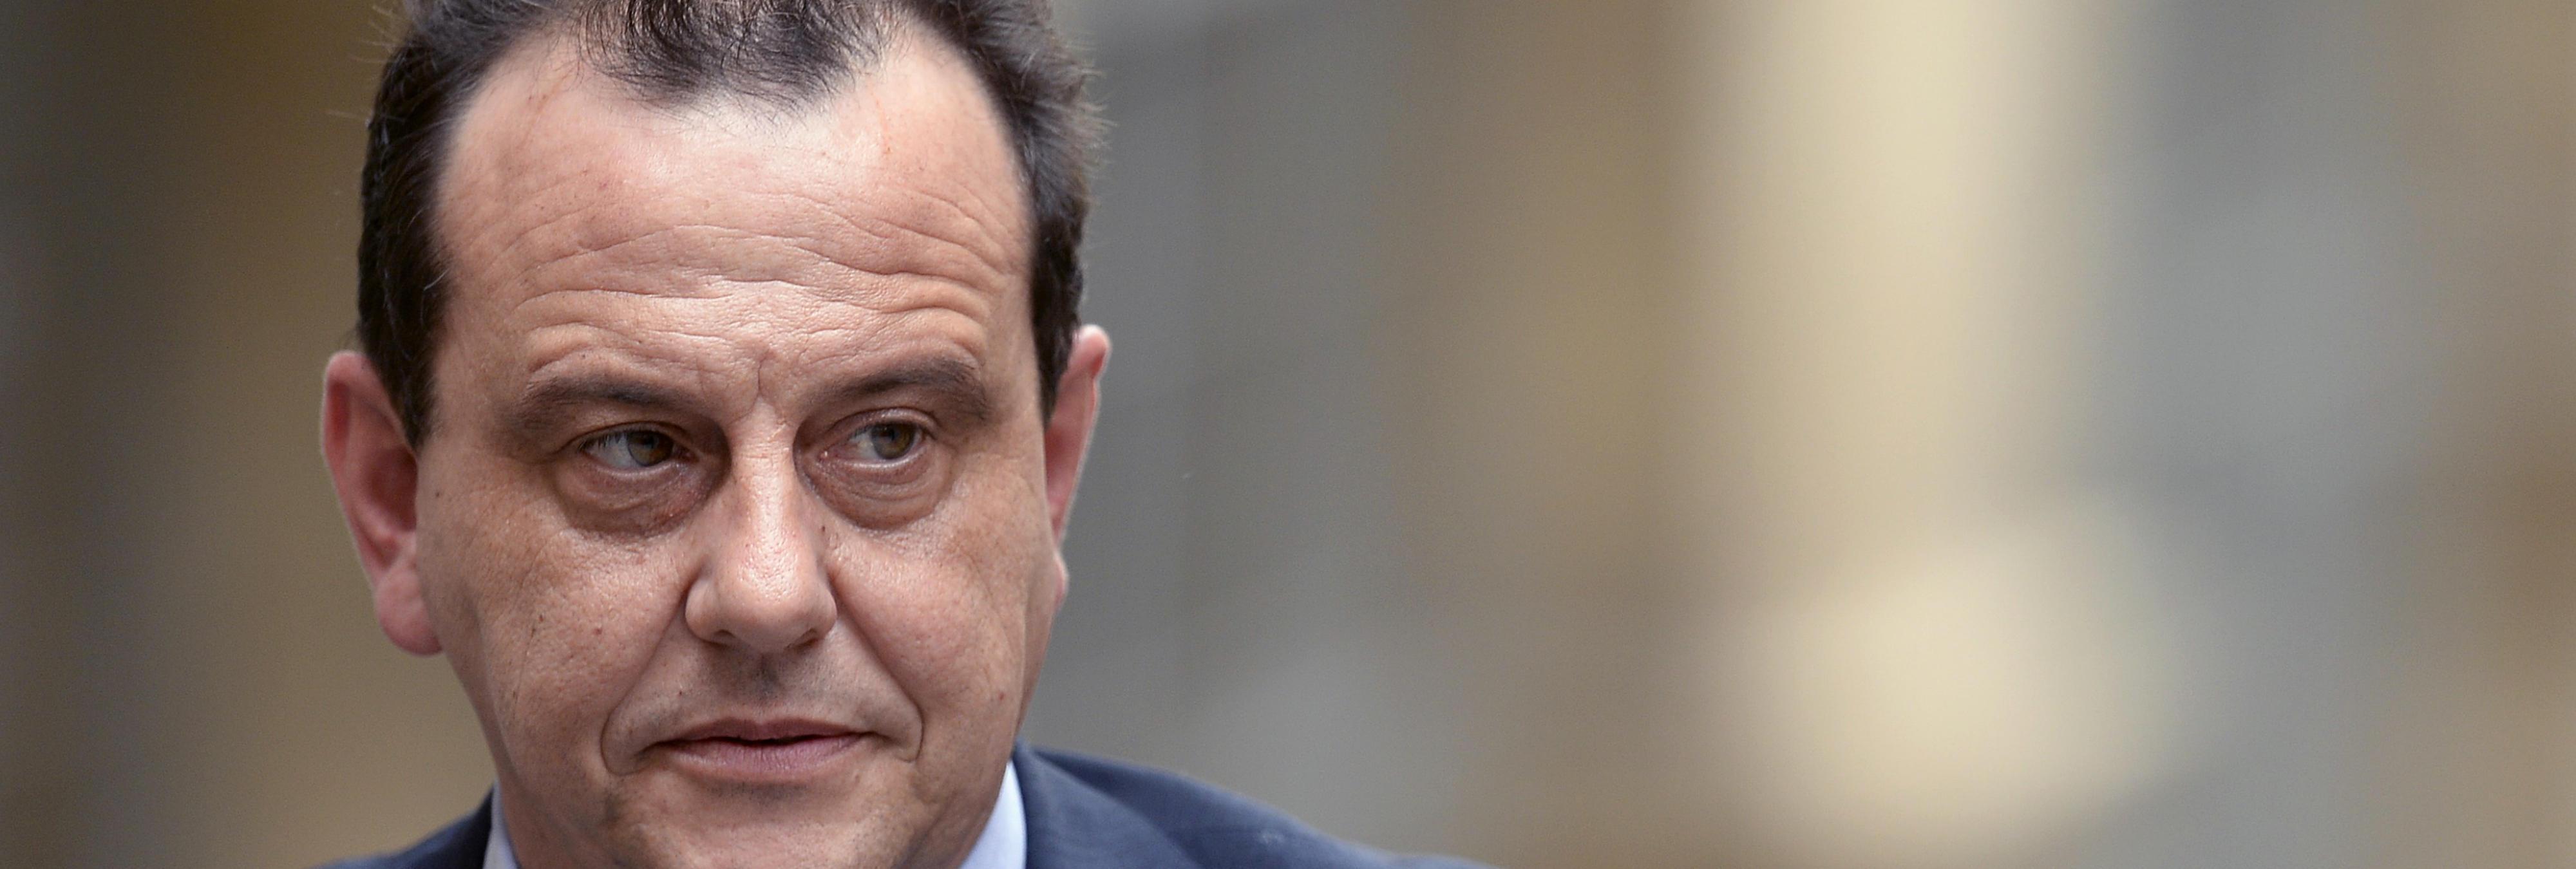 El fiscal Horrach pedirá una pena de cárcel superior para Iñaki Urdangarín